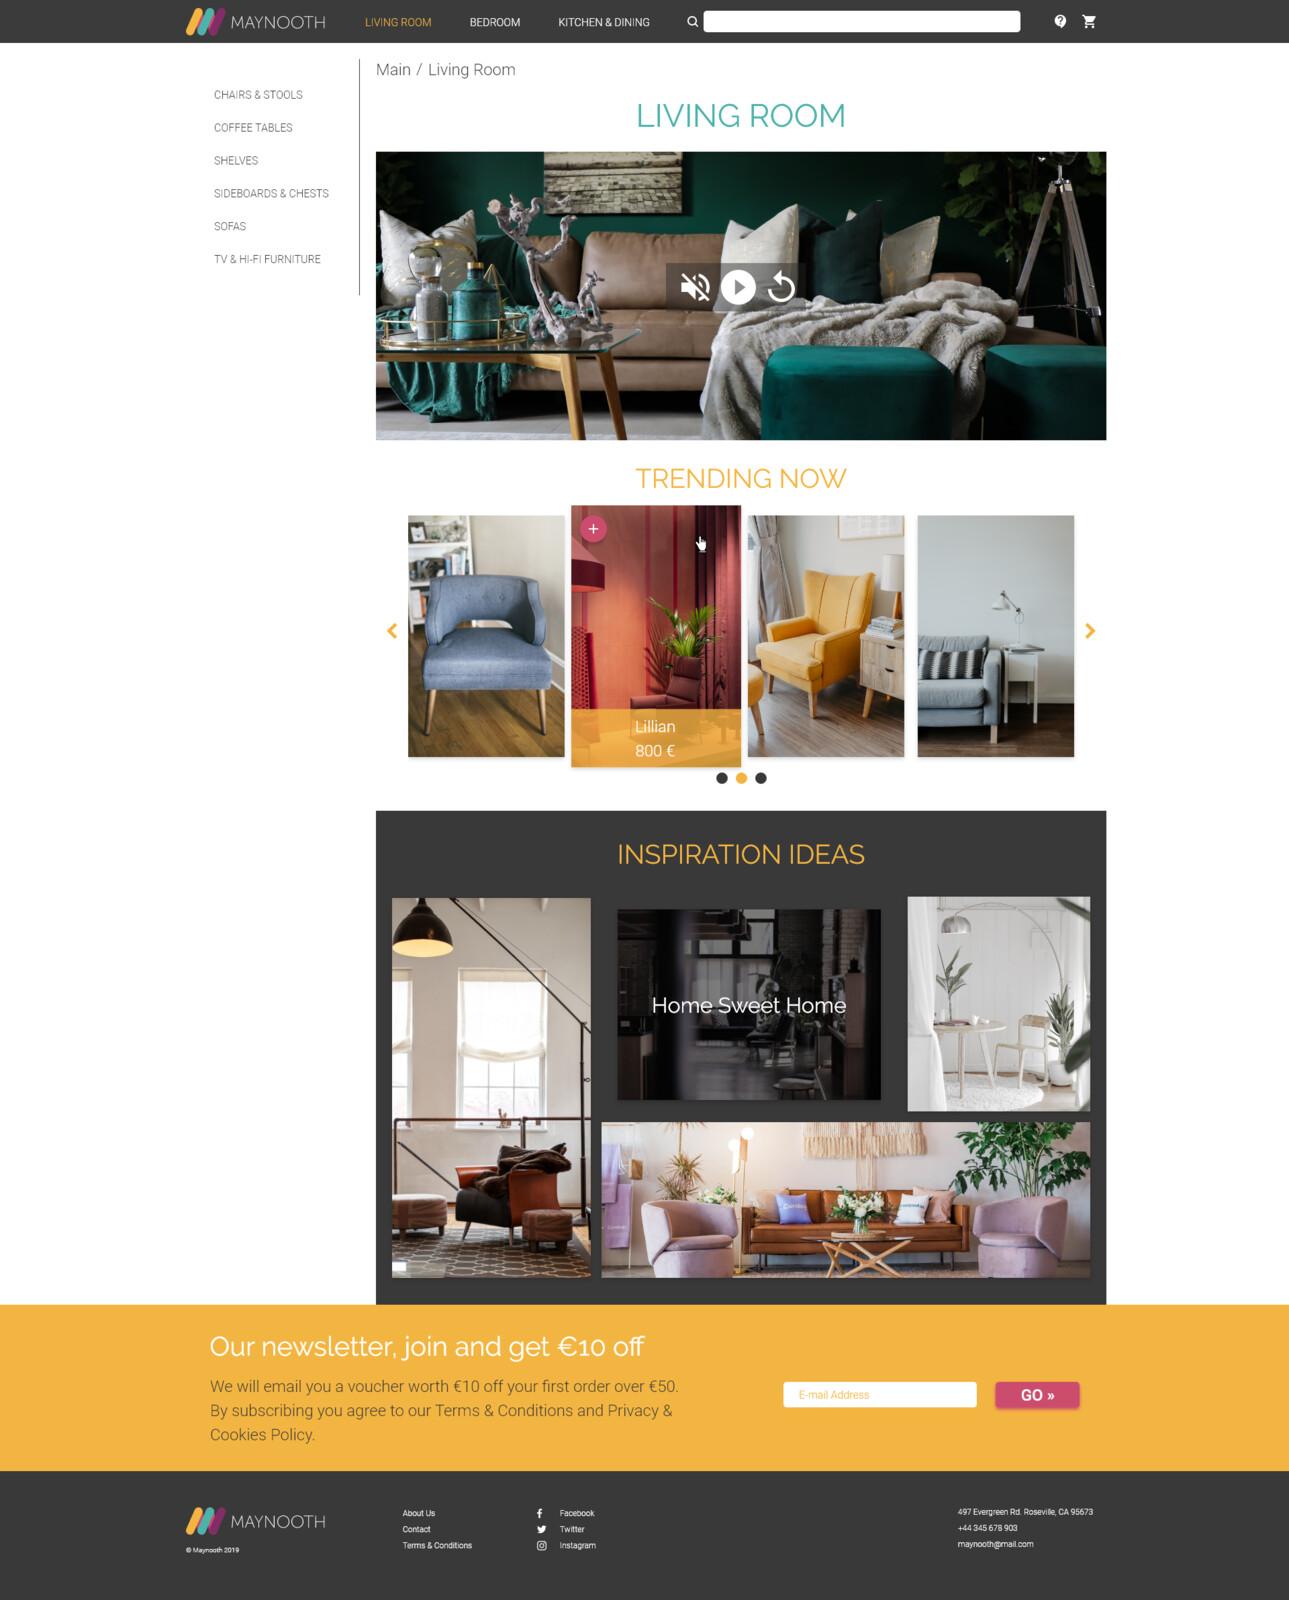 Living Room category